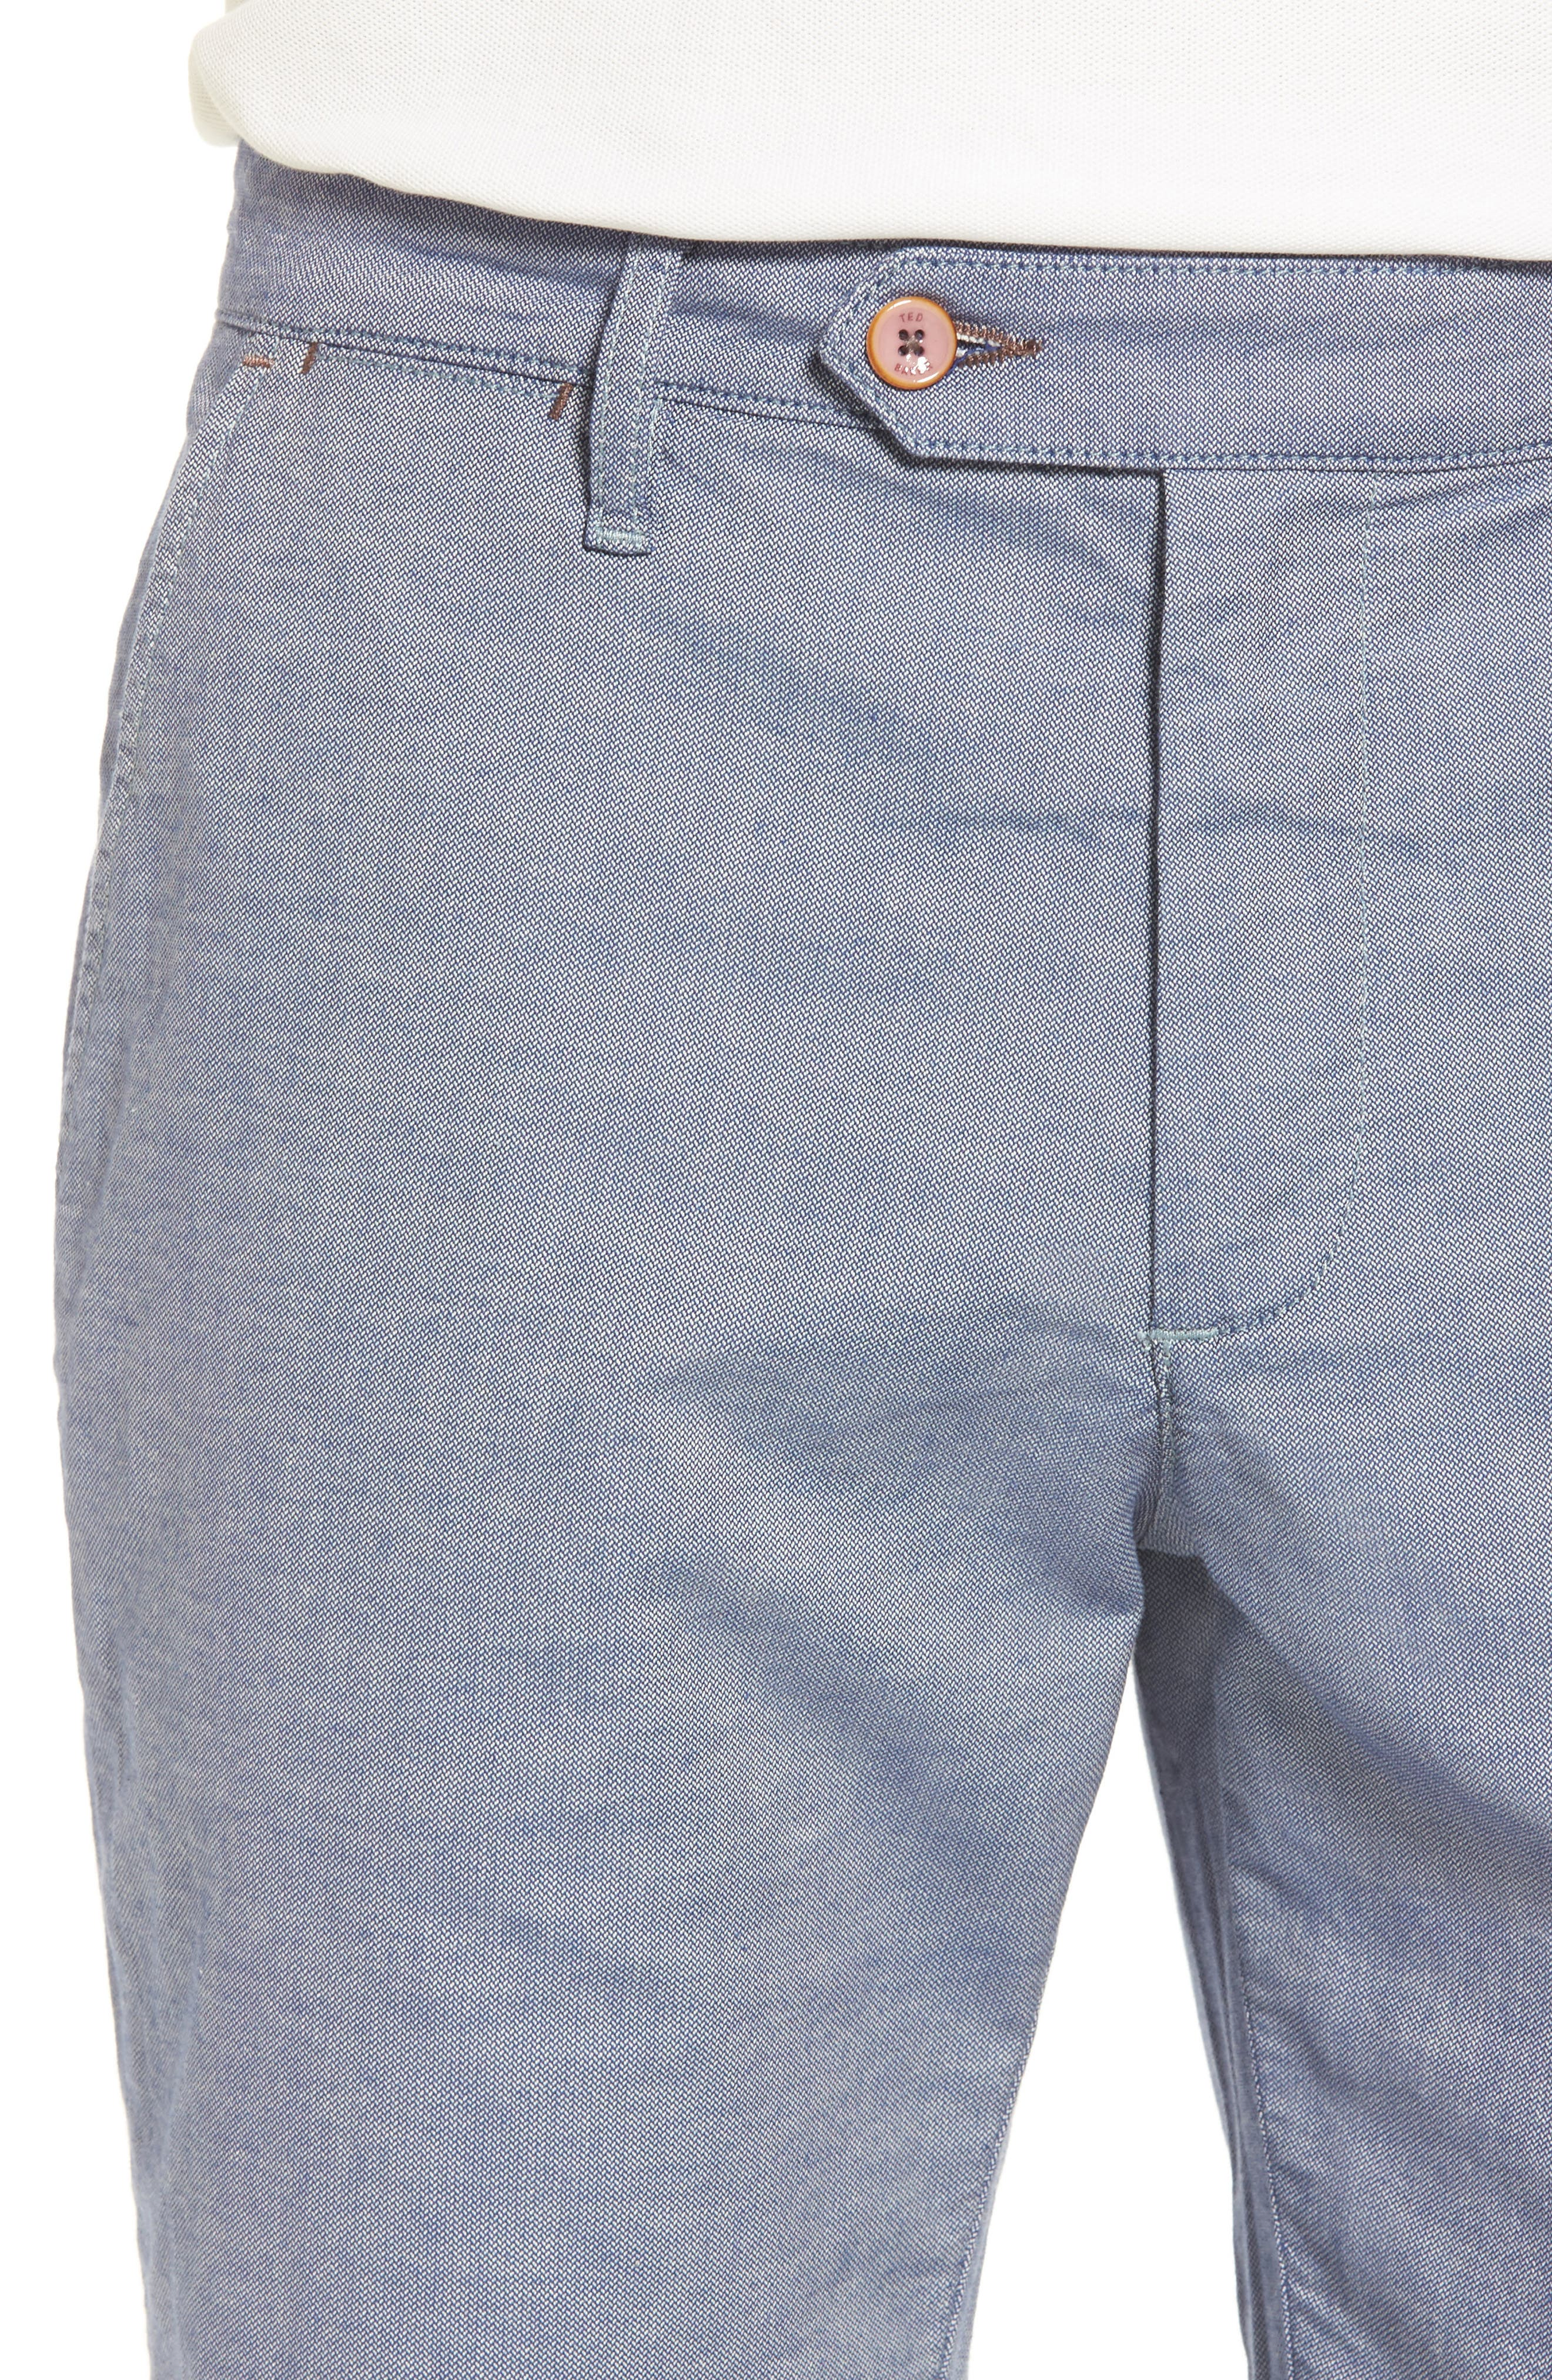 Herbosh Shorts,                             Alternate thumbnail 4, color,                             Navy